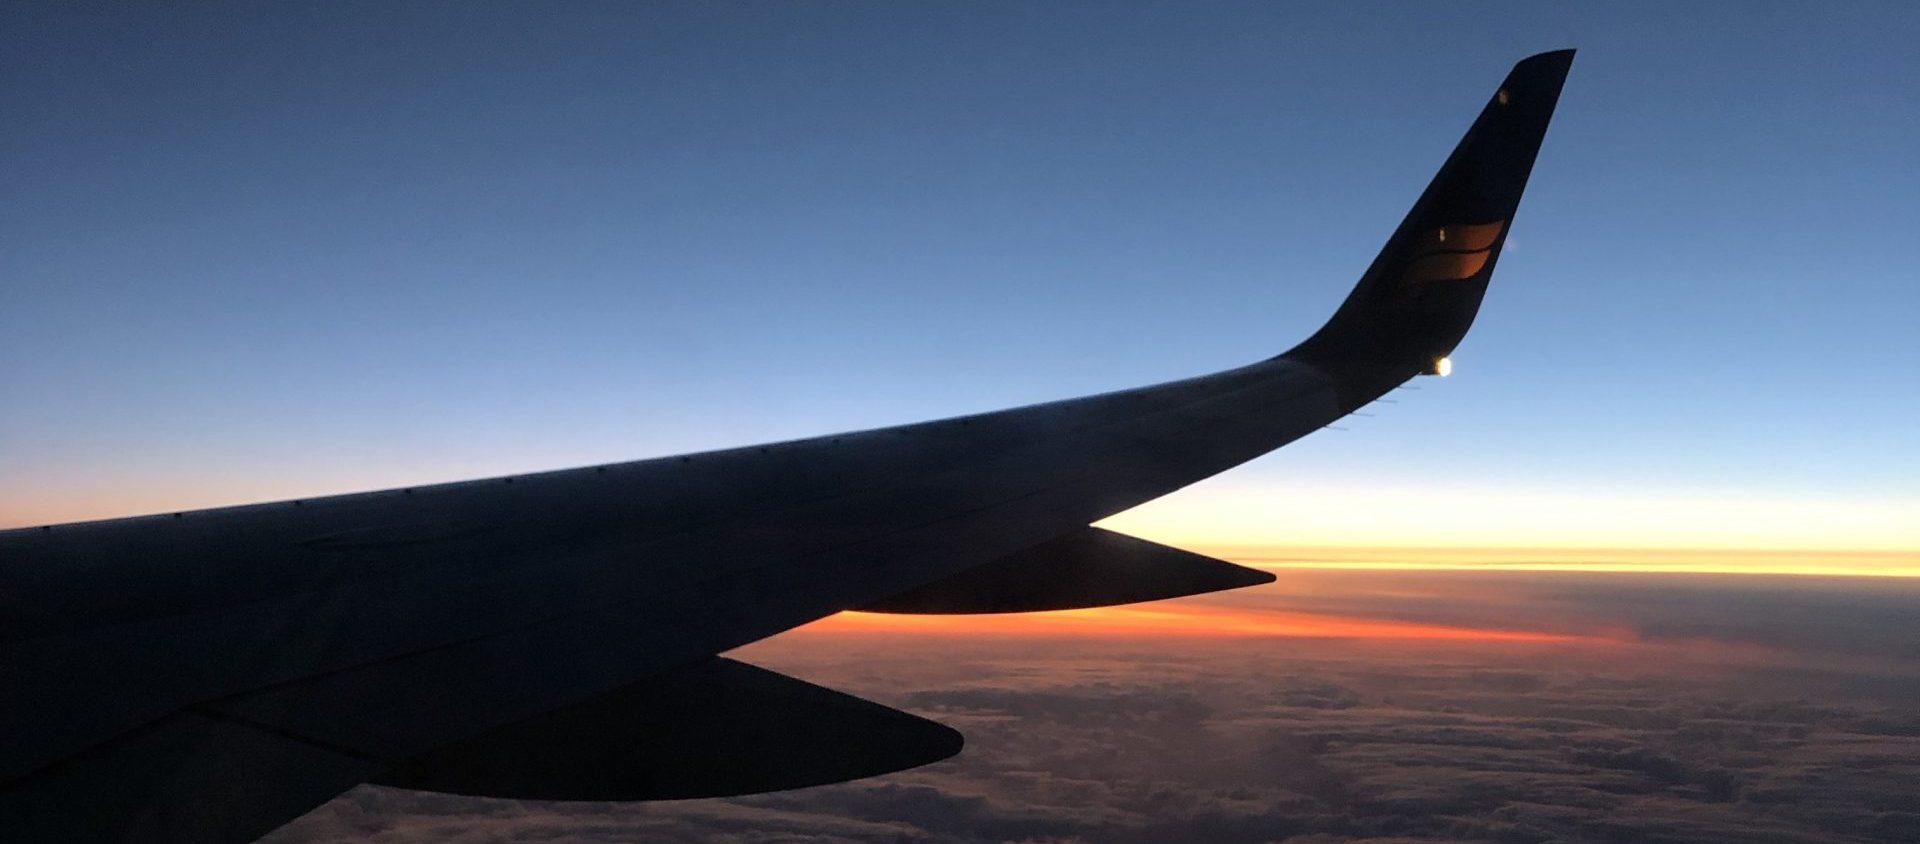 Travel After Coronavirus - The Traveling Storygirl